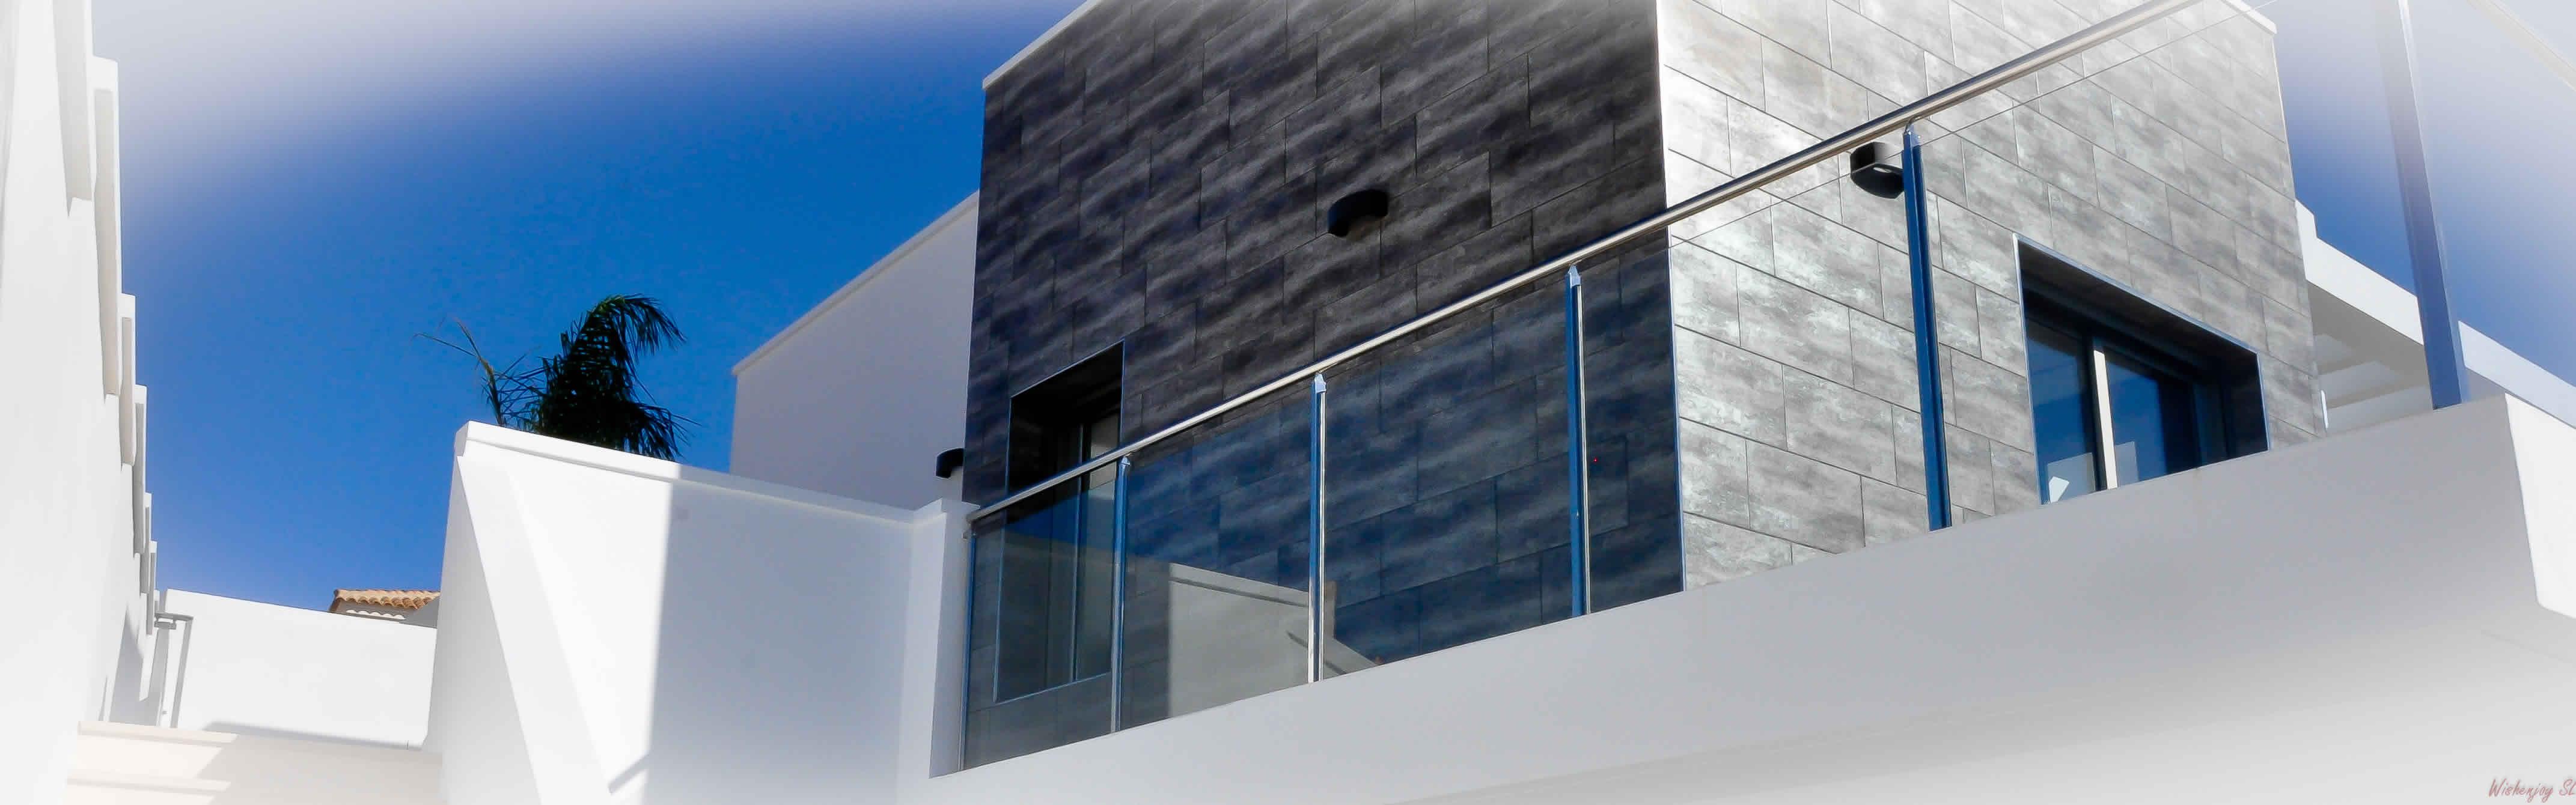 Prachtige design bungalow